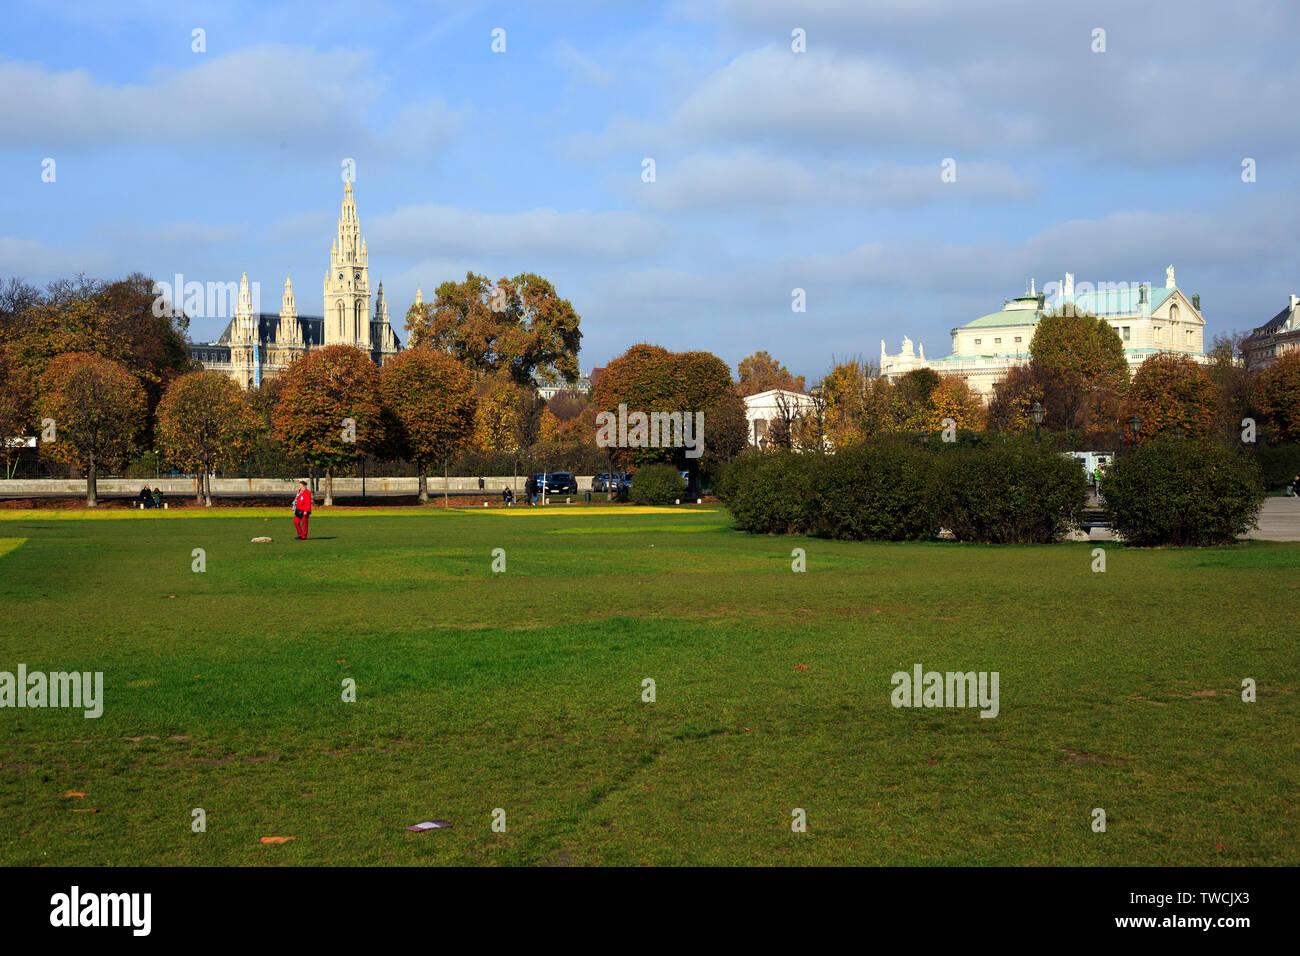 Vienna, Austria - November 1, 2013: few people walking at Sigmund-Freud Park. In 1961 the park in Alser was renamed to Sigmund -Freud Park - Stock Image